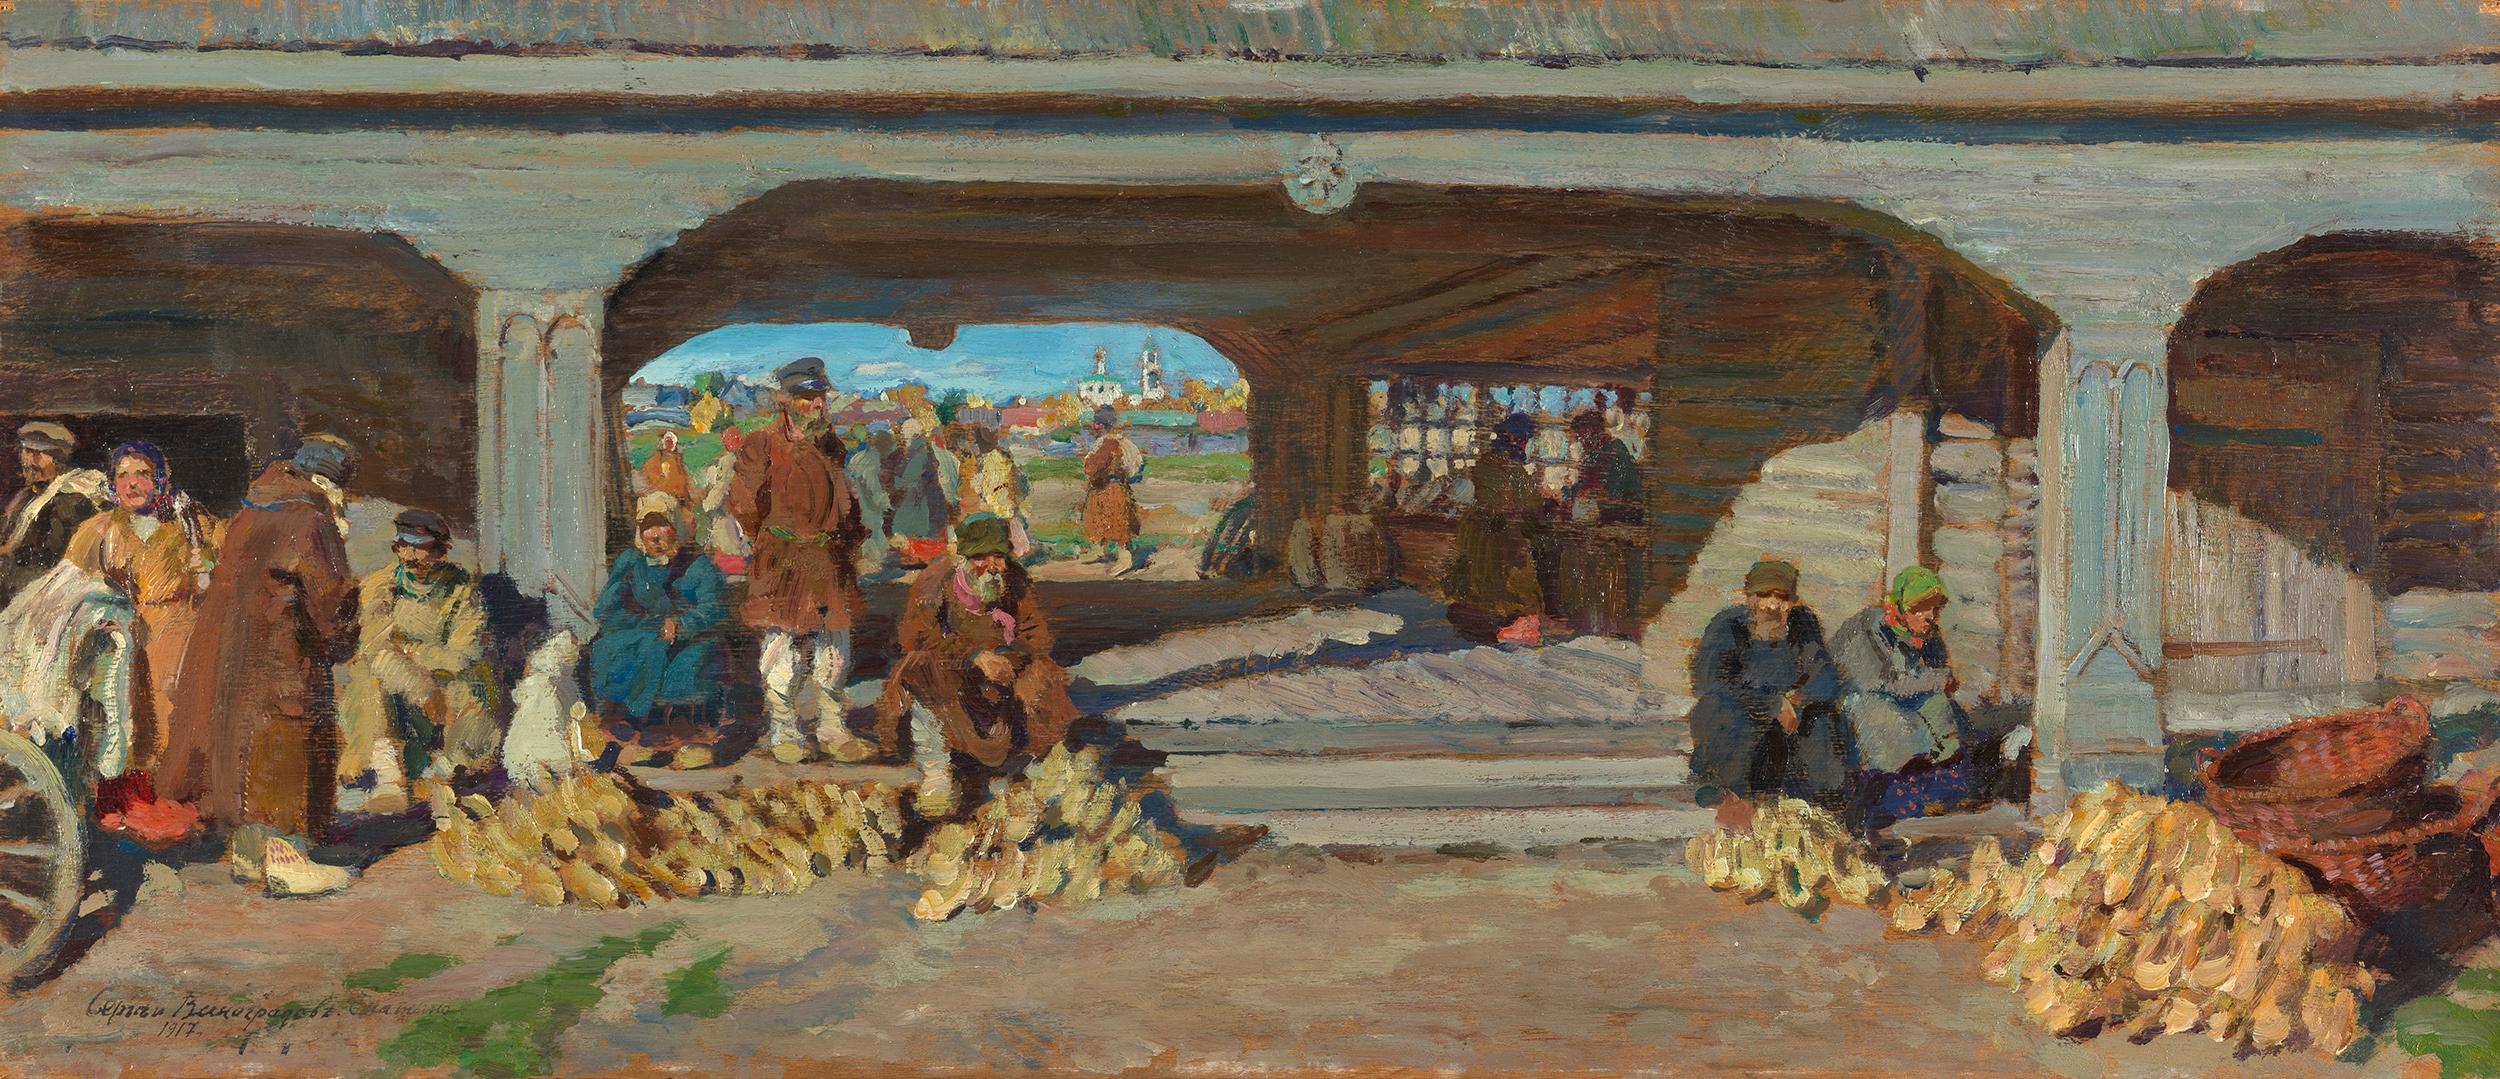 Vinogradov Arsenievich Sergei | Bast Shoe Sellers, Town of Elatma on the  Oka River (1917) | MutualArt